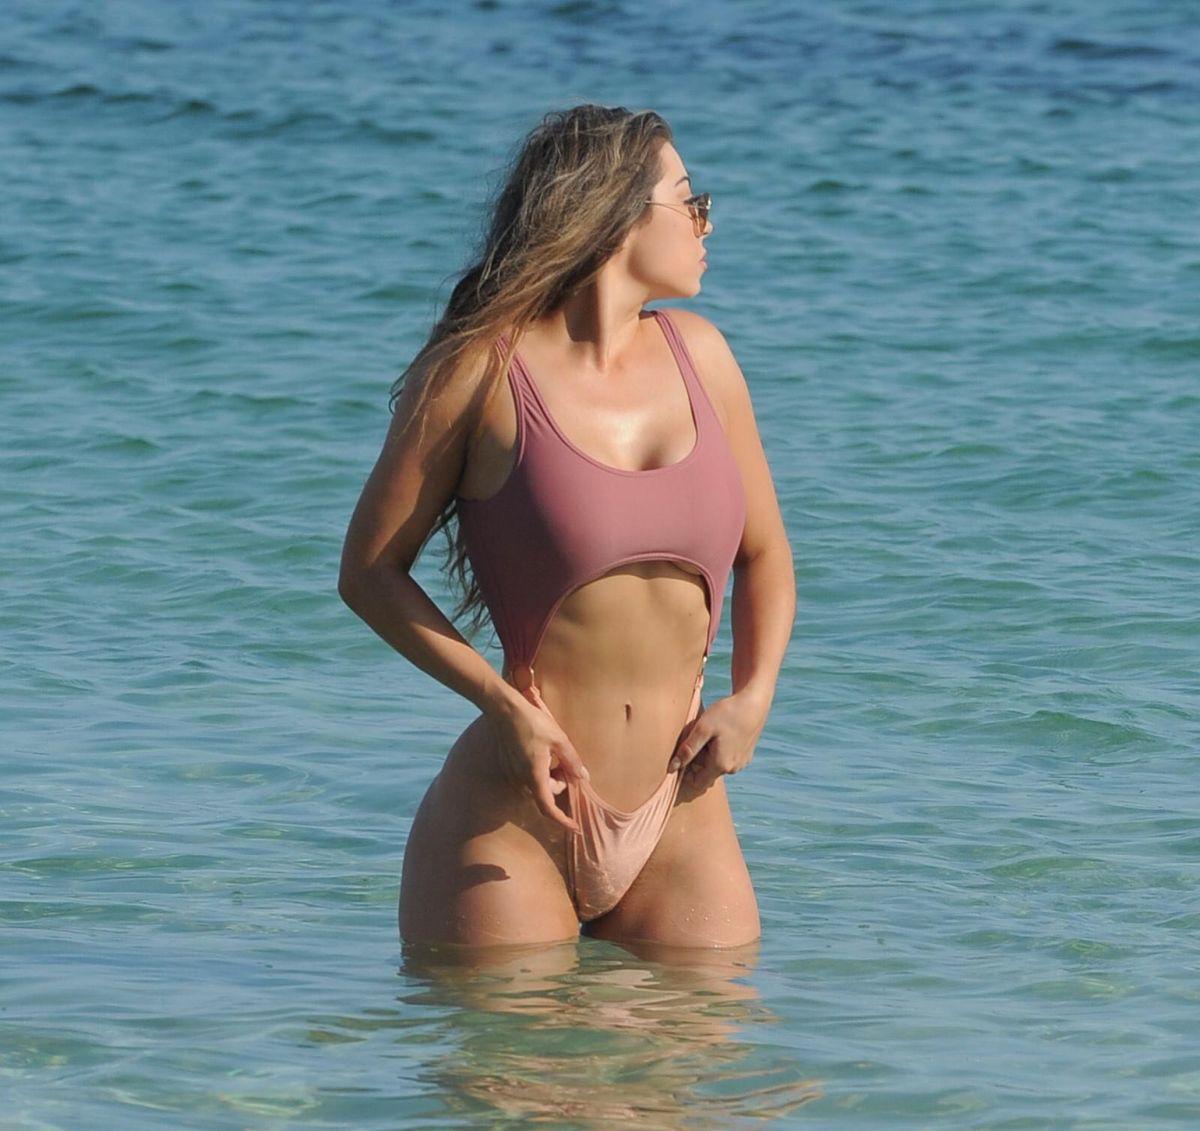 Bikini Abigail Clarke nudes (13 photo), Pussy, Fappening, Boobs, panties 2017